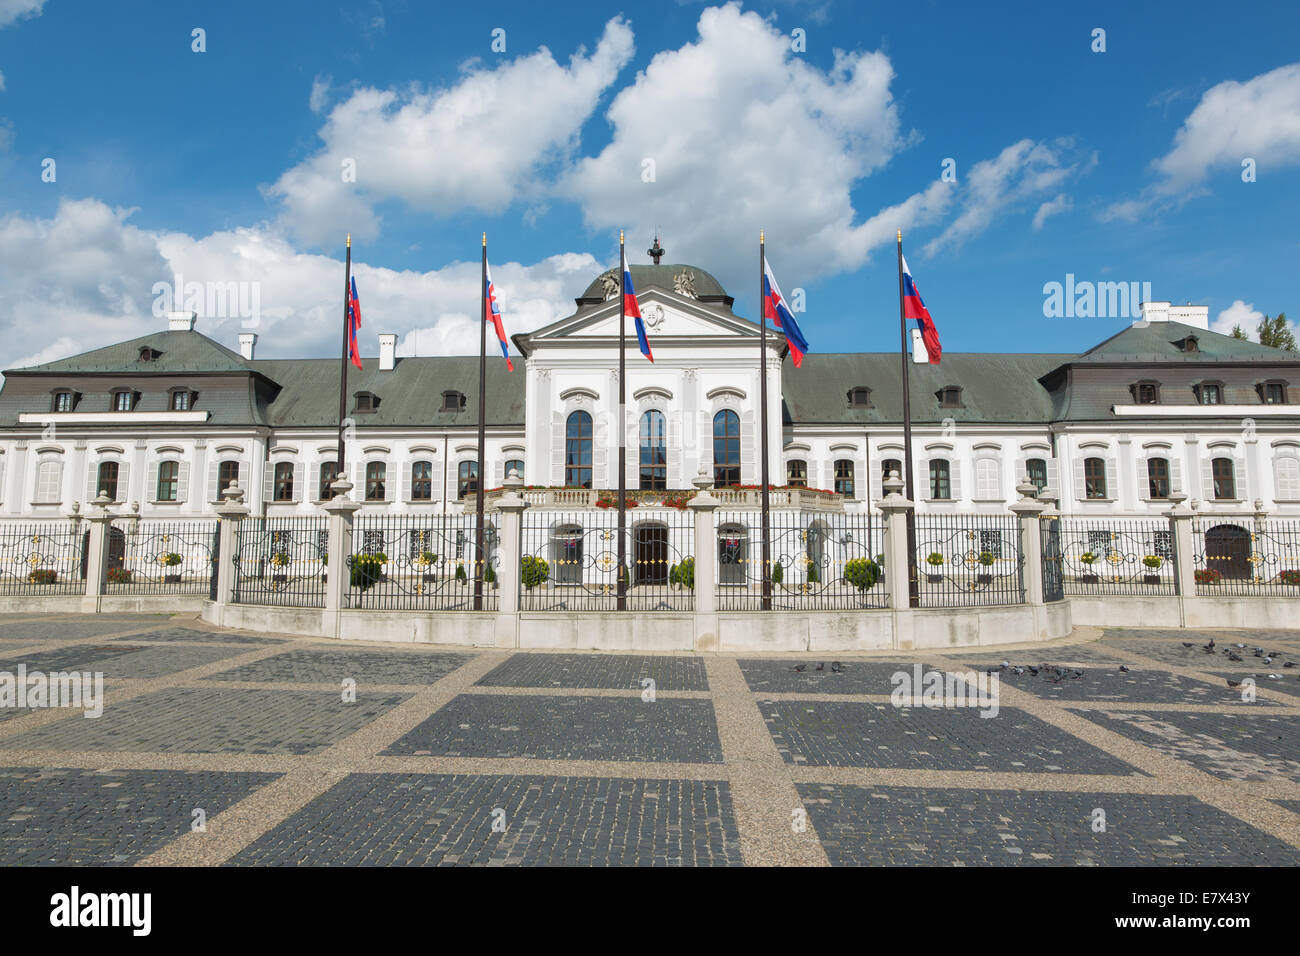 BRATISLAVA, Eslovaquia - Septiembre 21, 2014: Los Presidentes (o Grasalkovic) Palacio. Foto de stock